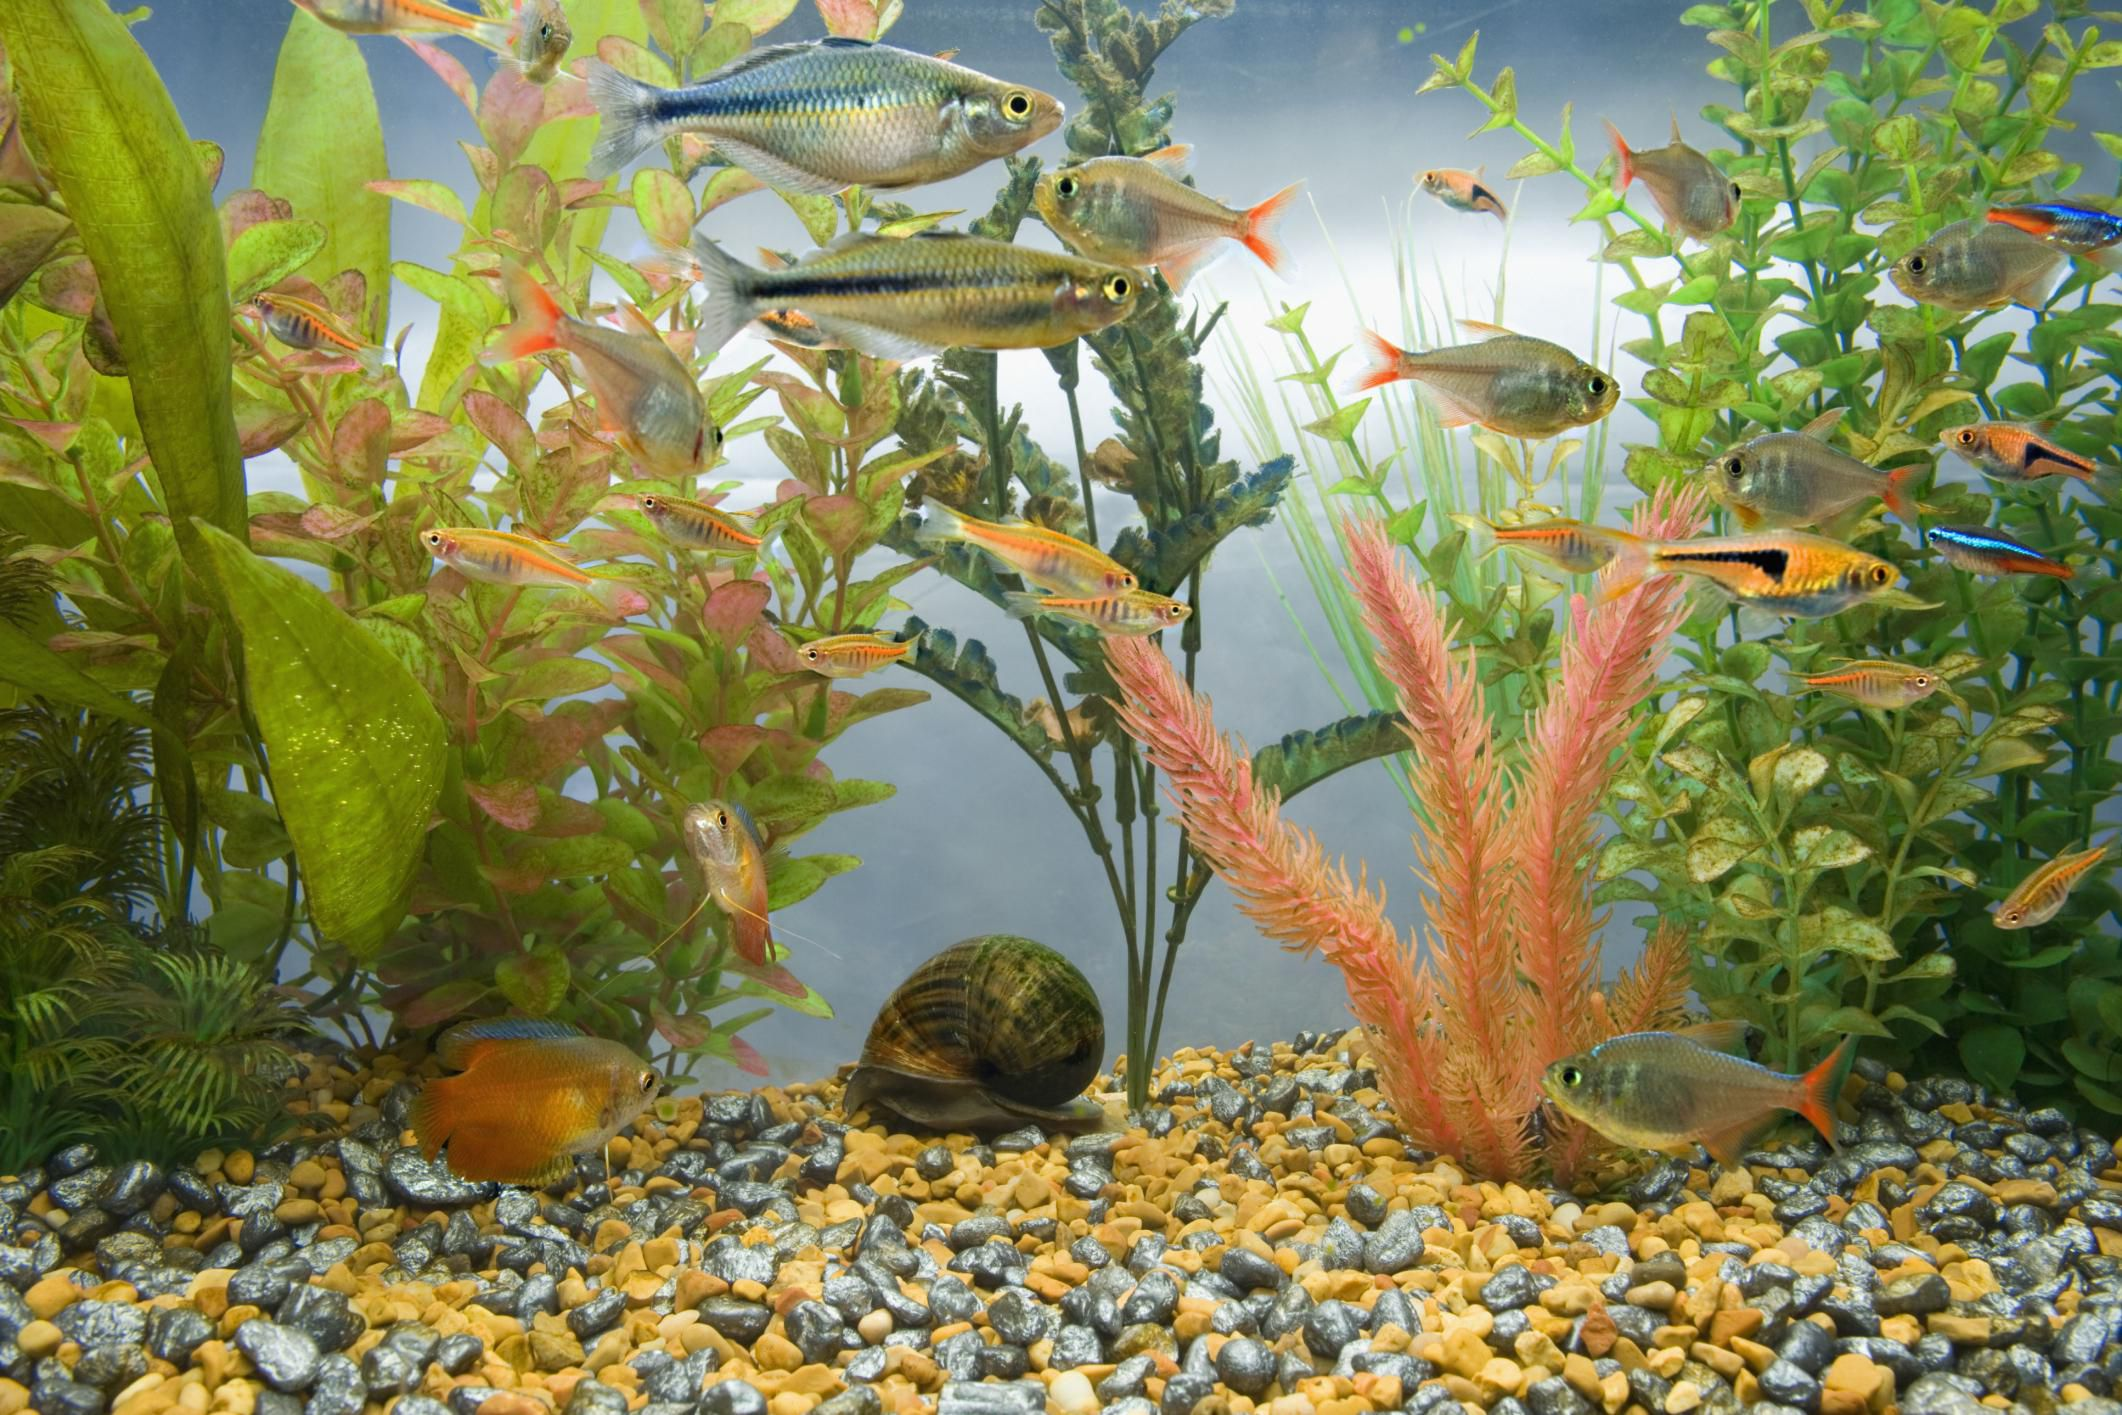 Optimal tank temperatures for a saltwater aquarium for Tropical fish temperature